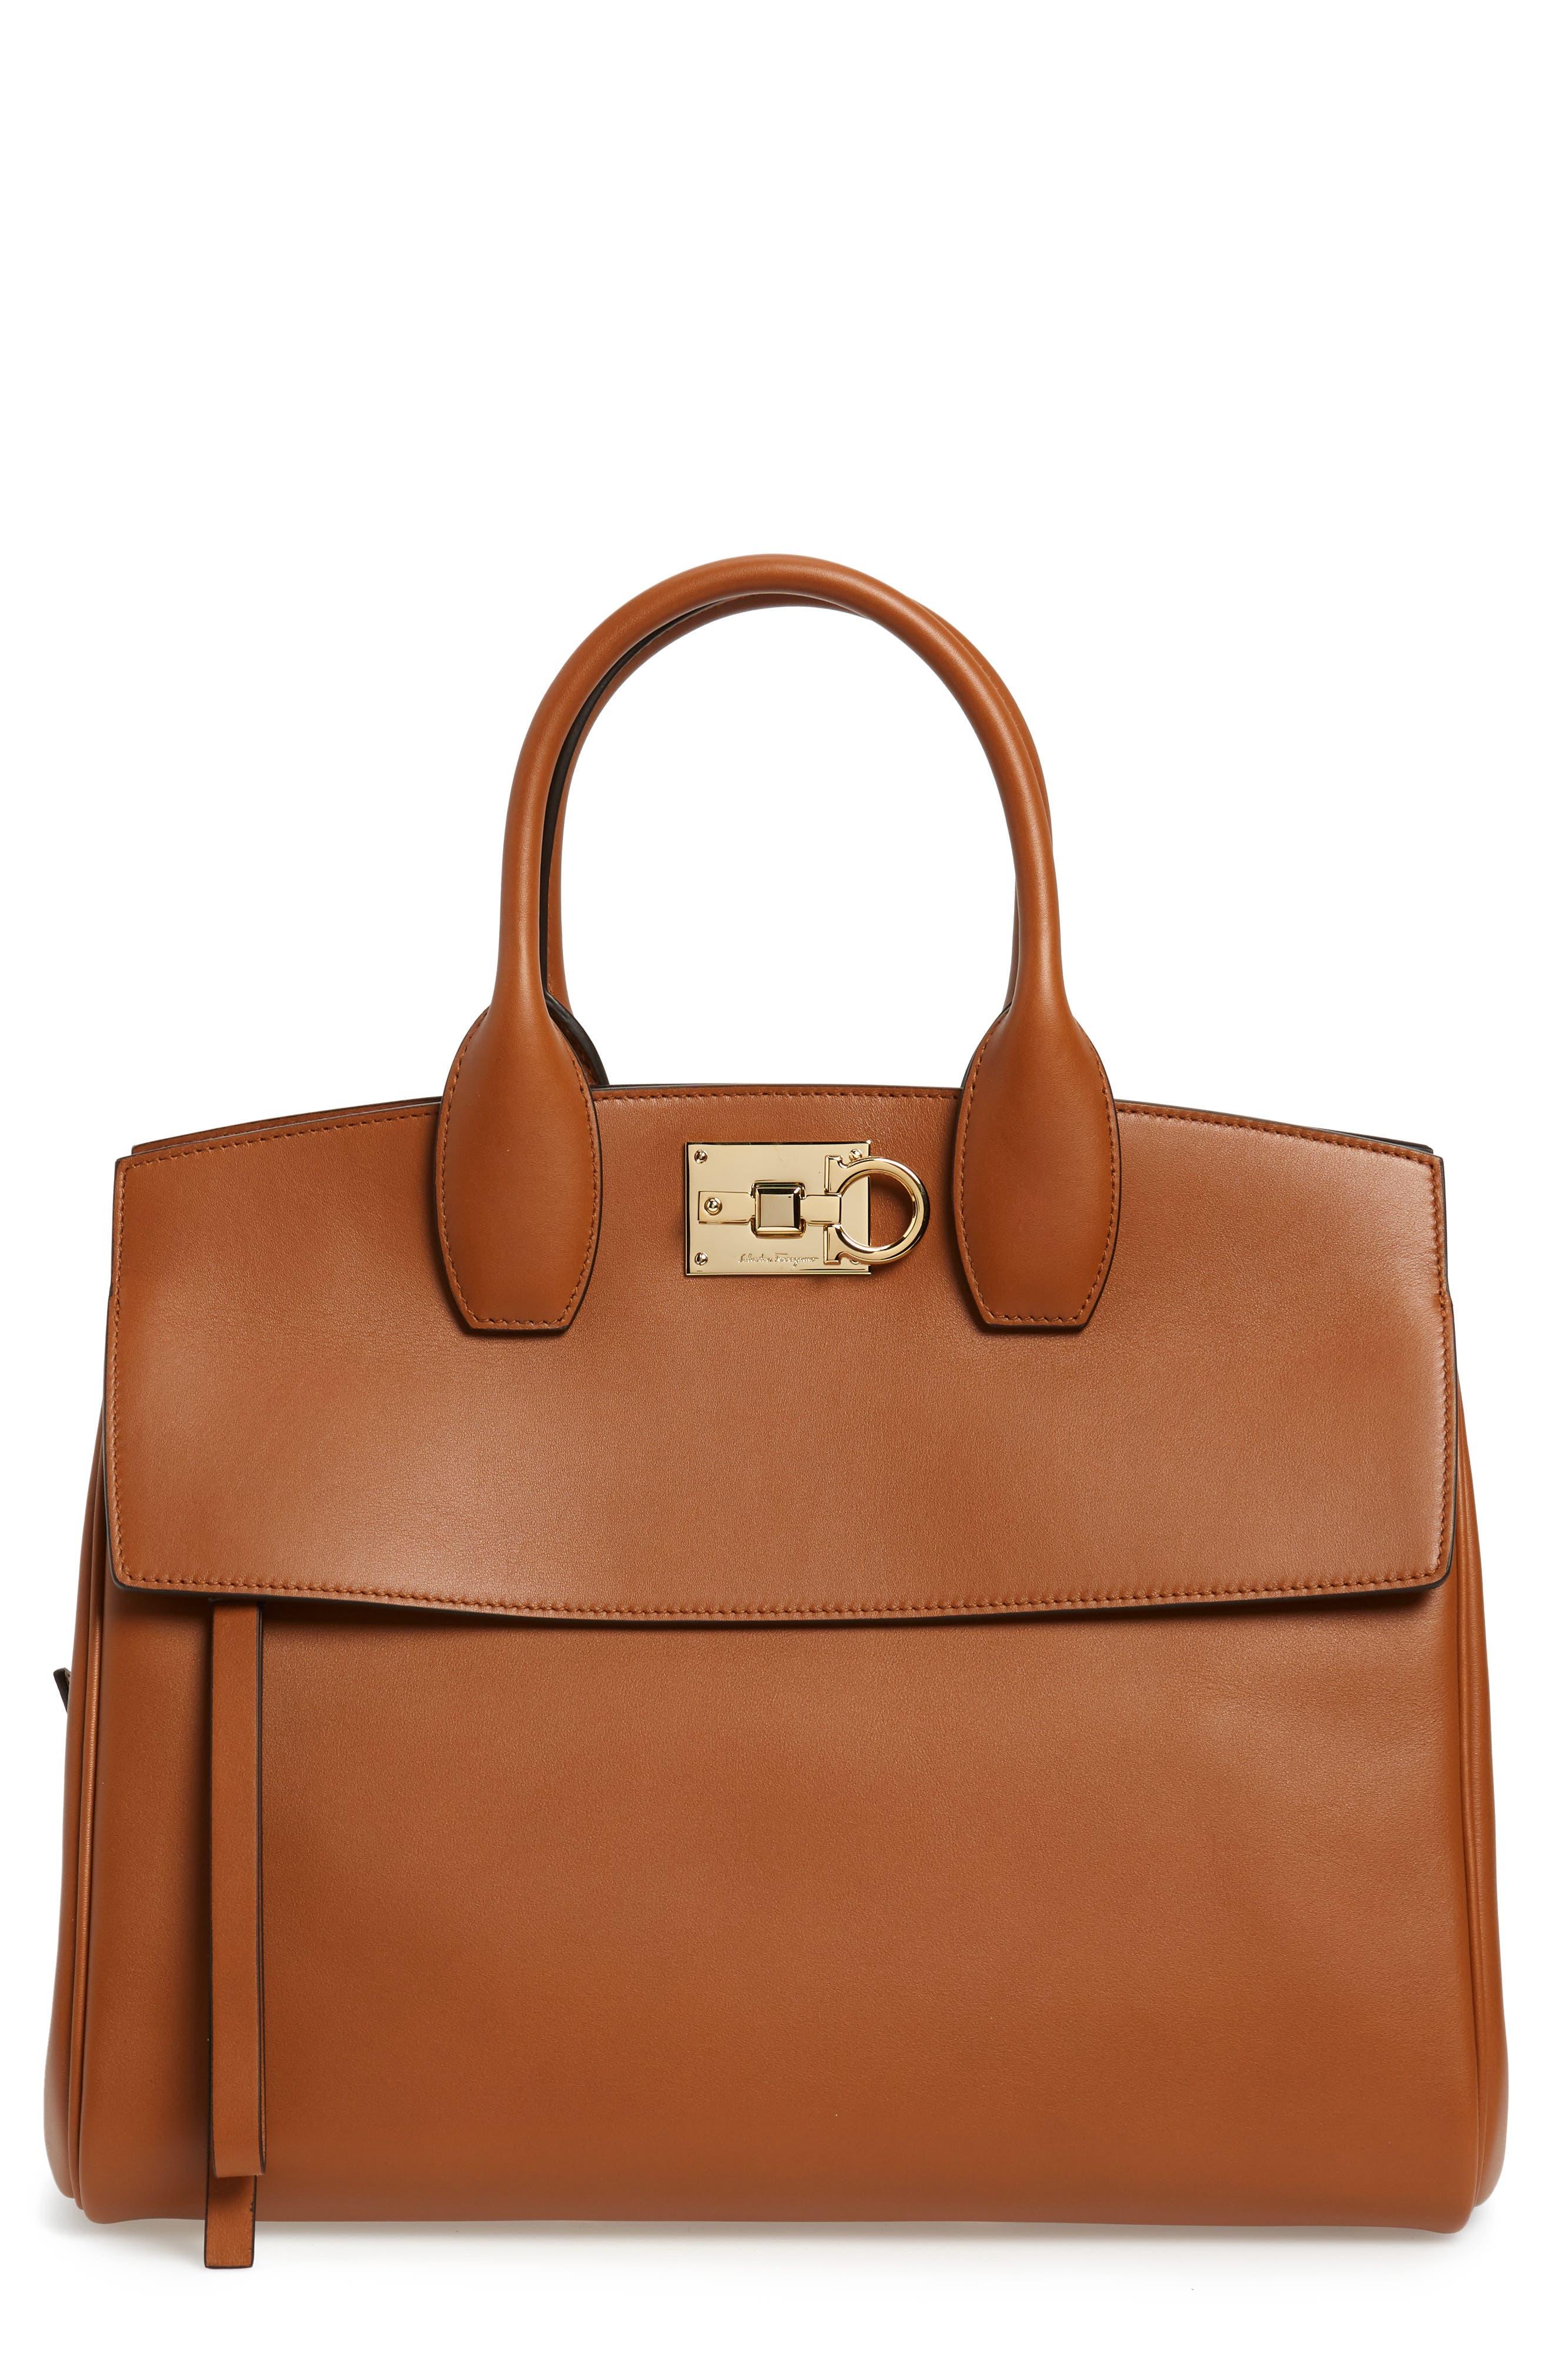 SALVATORE FERRAGAMO, Medium The Studio Calfskin Leather Top Handle Bag, Main thumbnail 1, color, SELLA